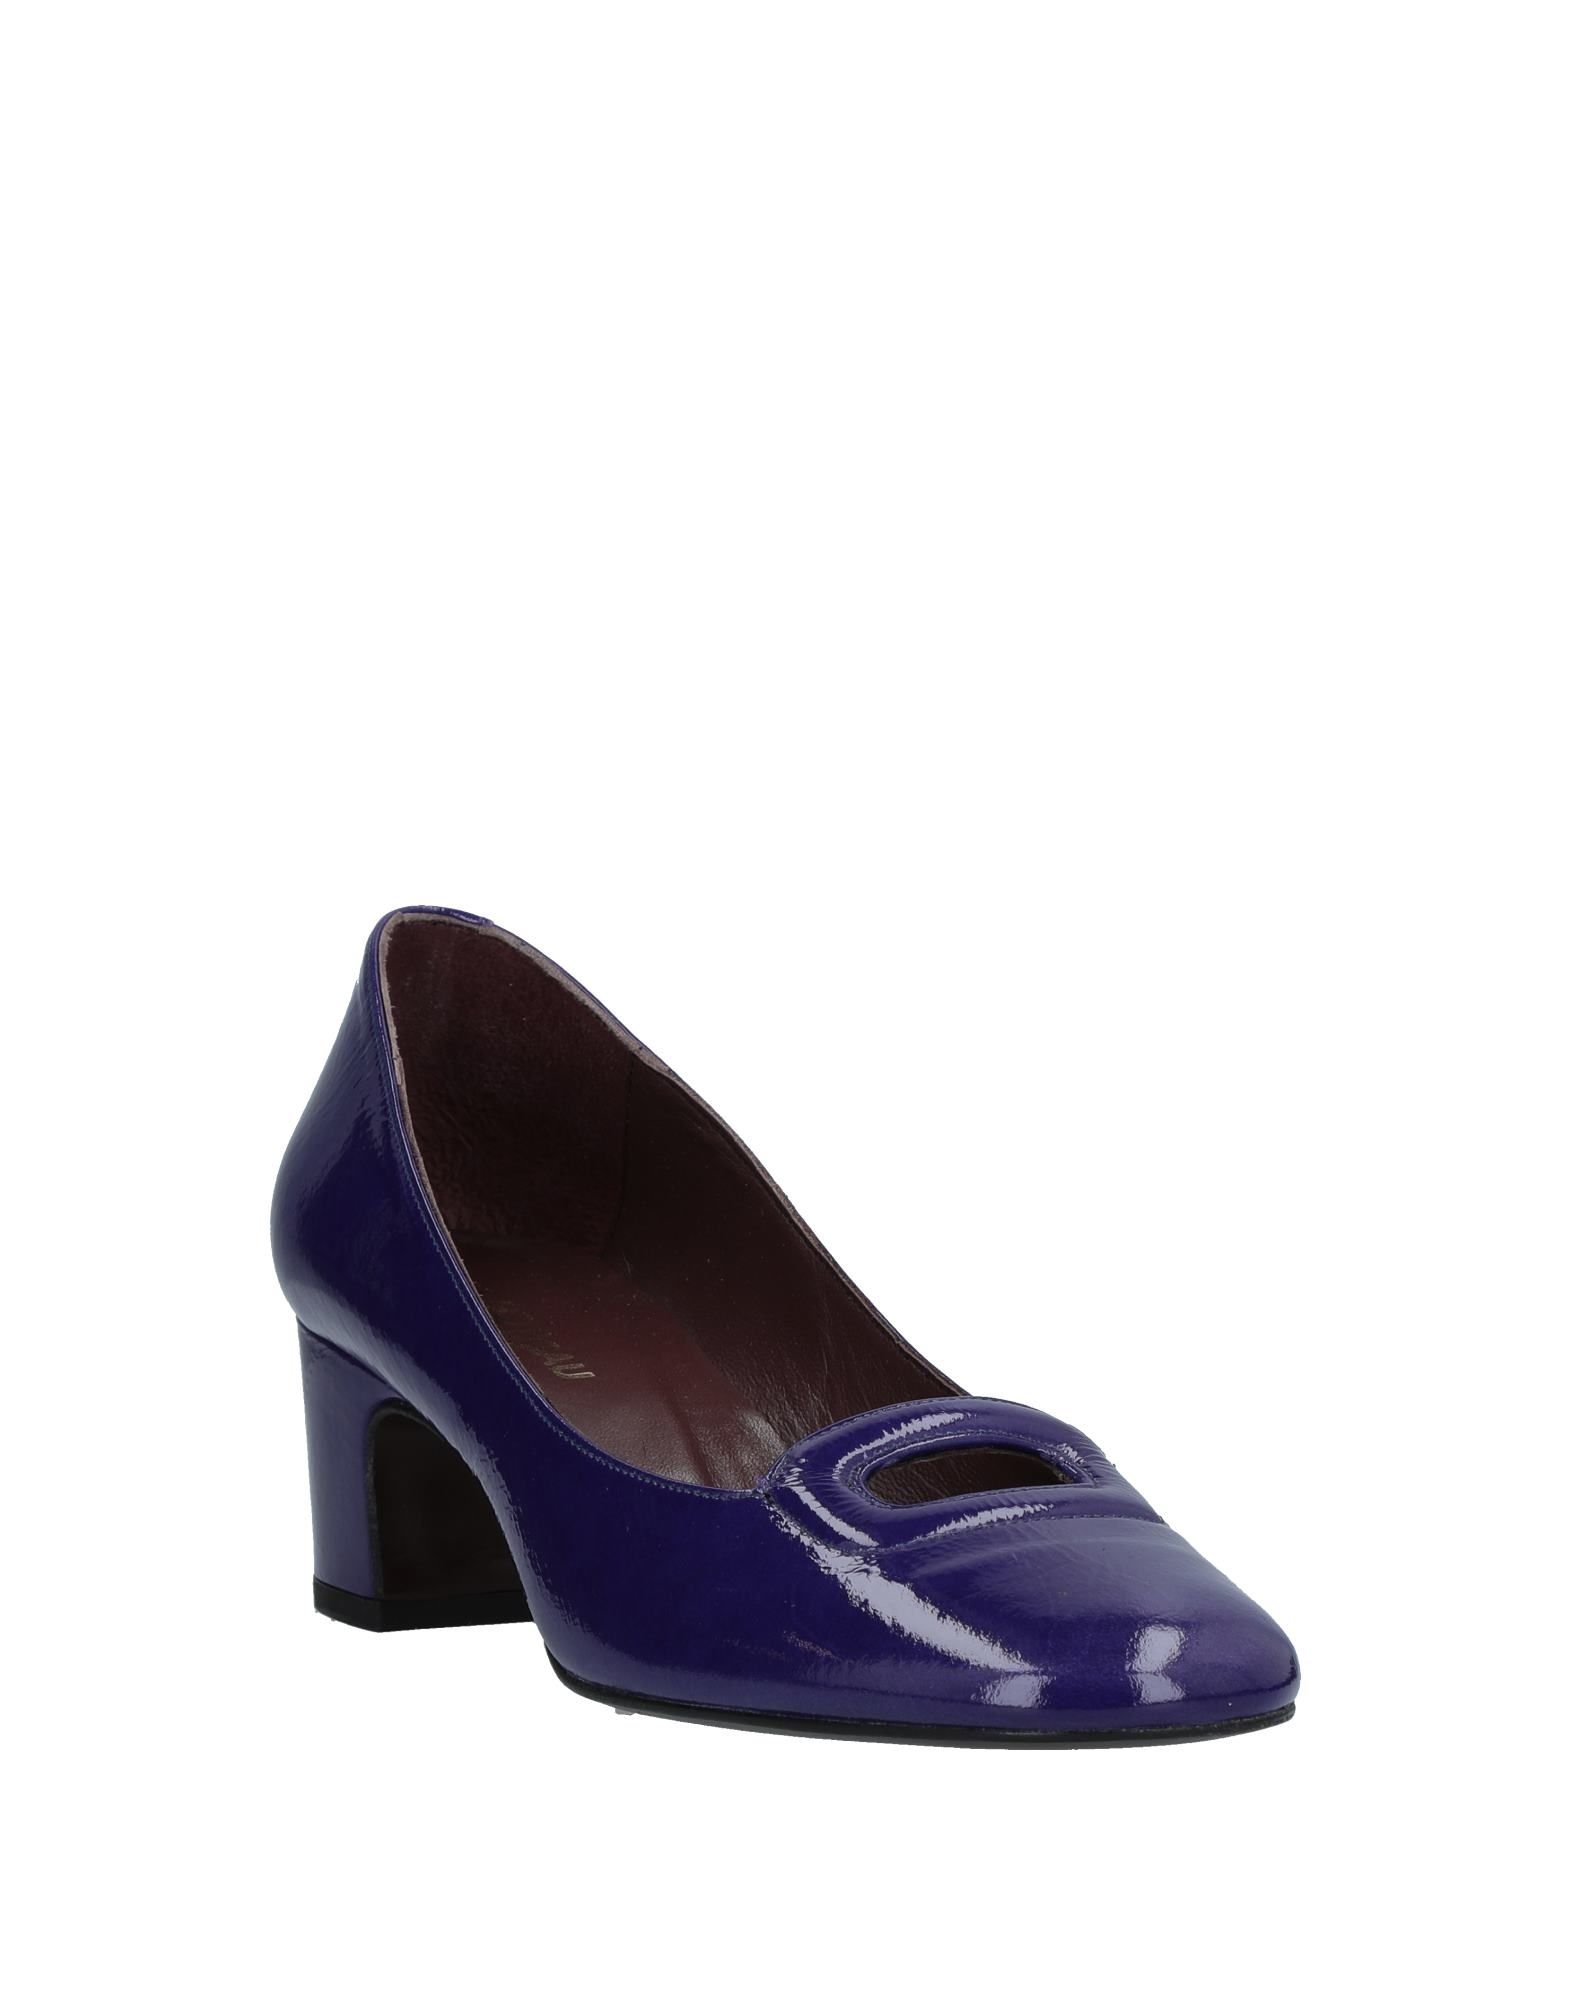 Stilvolle billige Schuhe Avril 11539371ME Gau Pumps Damen  11539371ME Avril 5c7fbb